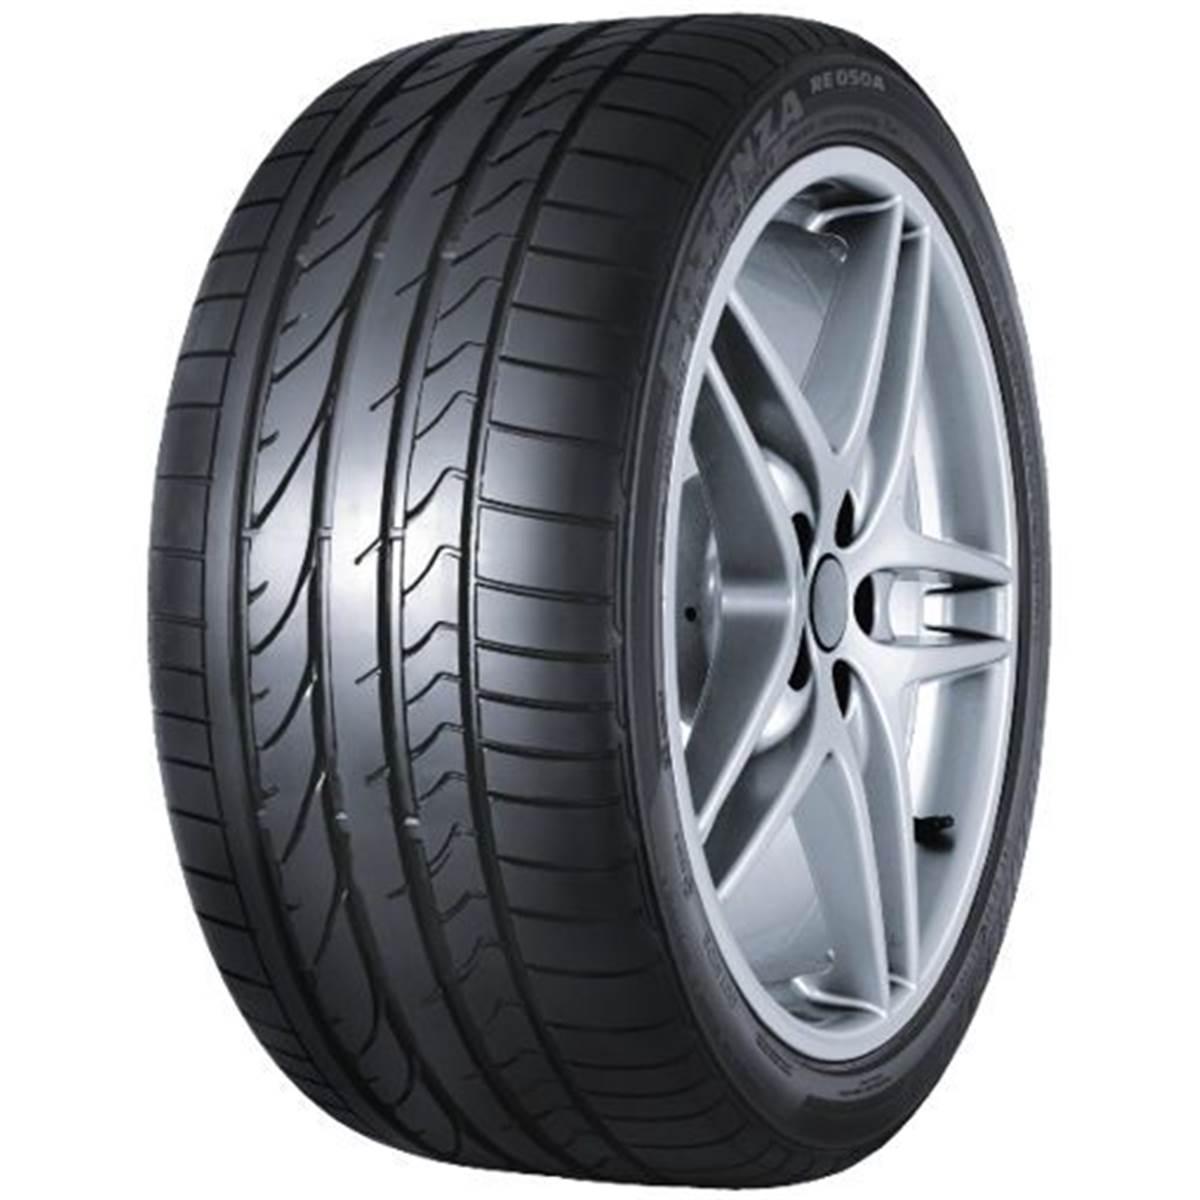 Pneu Bridgestone 275/35R19 96W Potenza Re050A